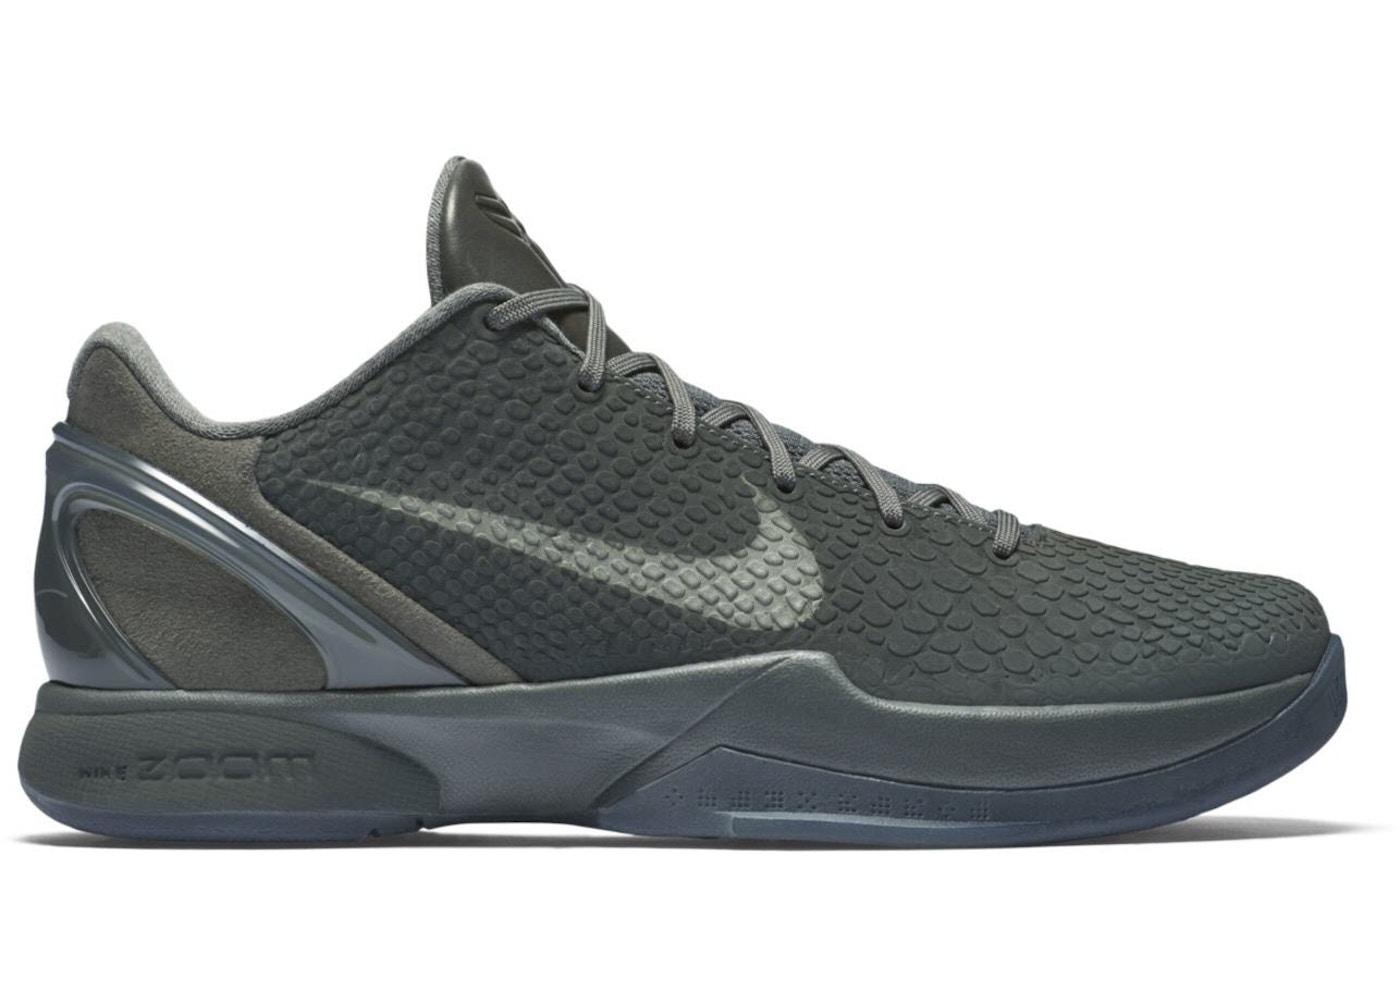 separation shoes 91b22 55b7c Kobe 6 Black Mamba Collection Fade to Black - 869457-007